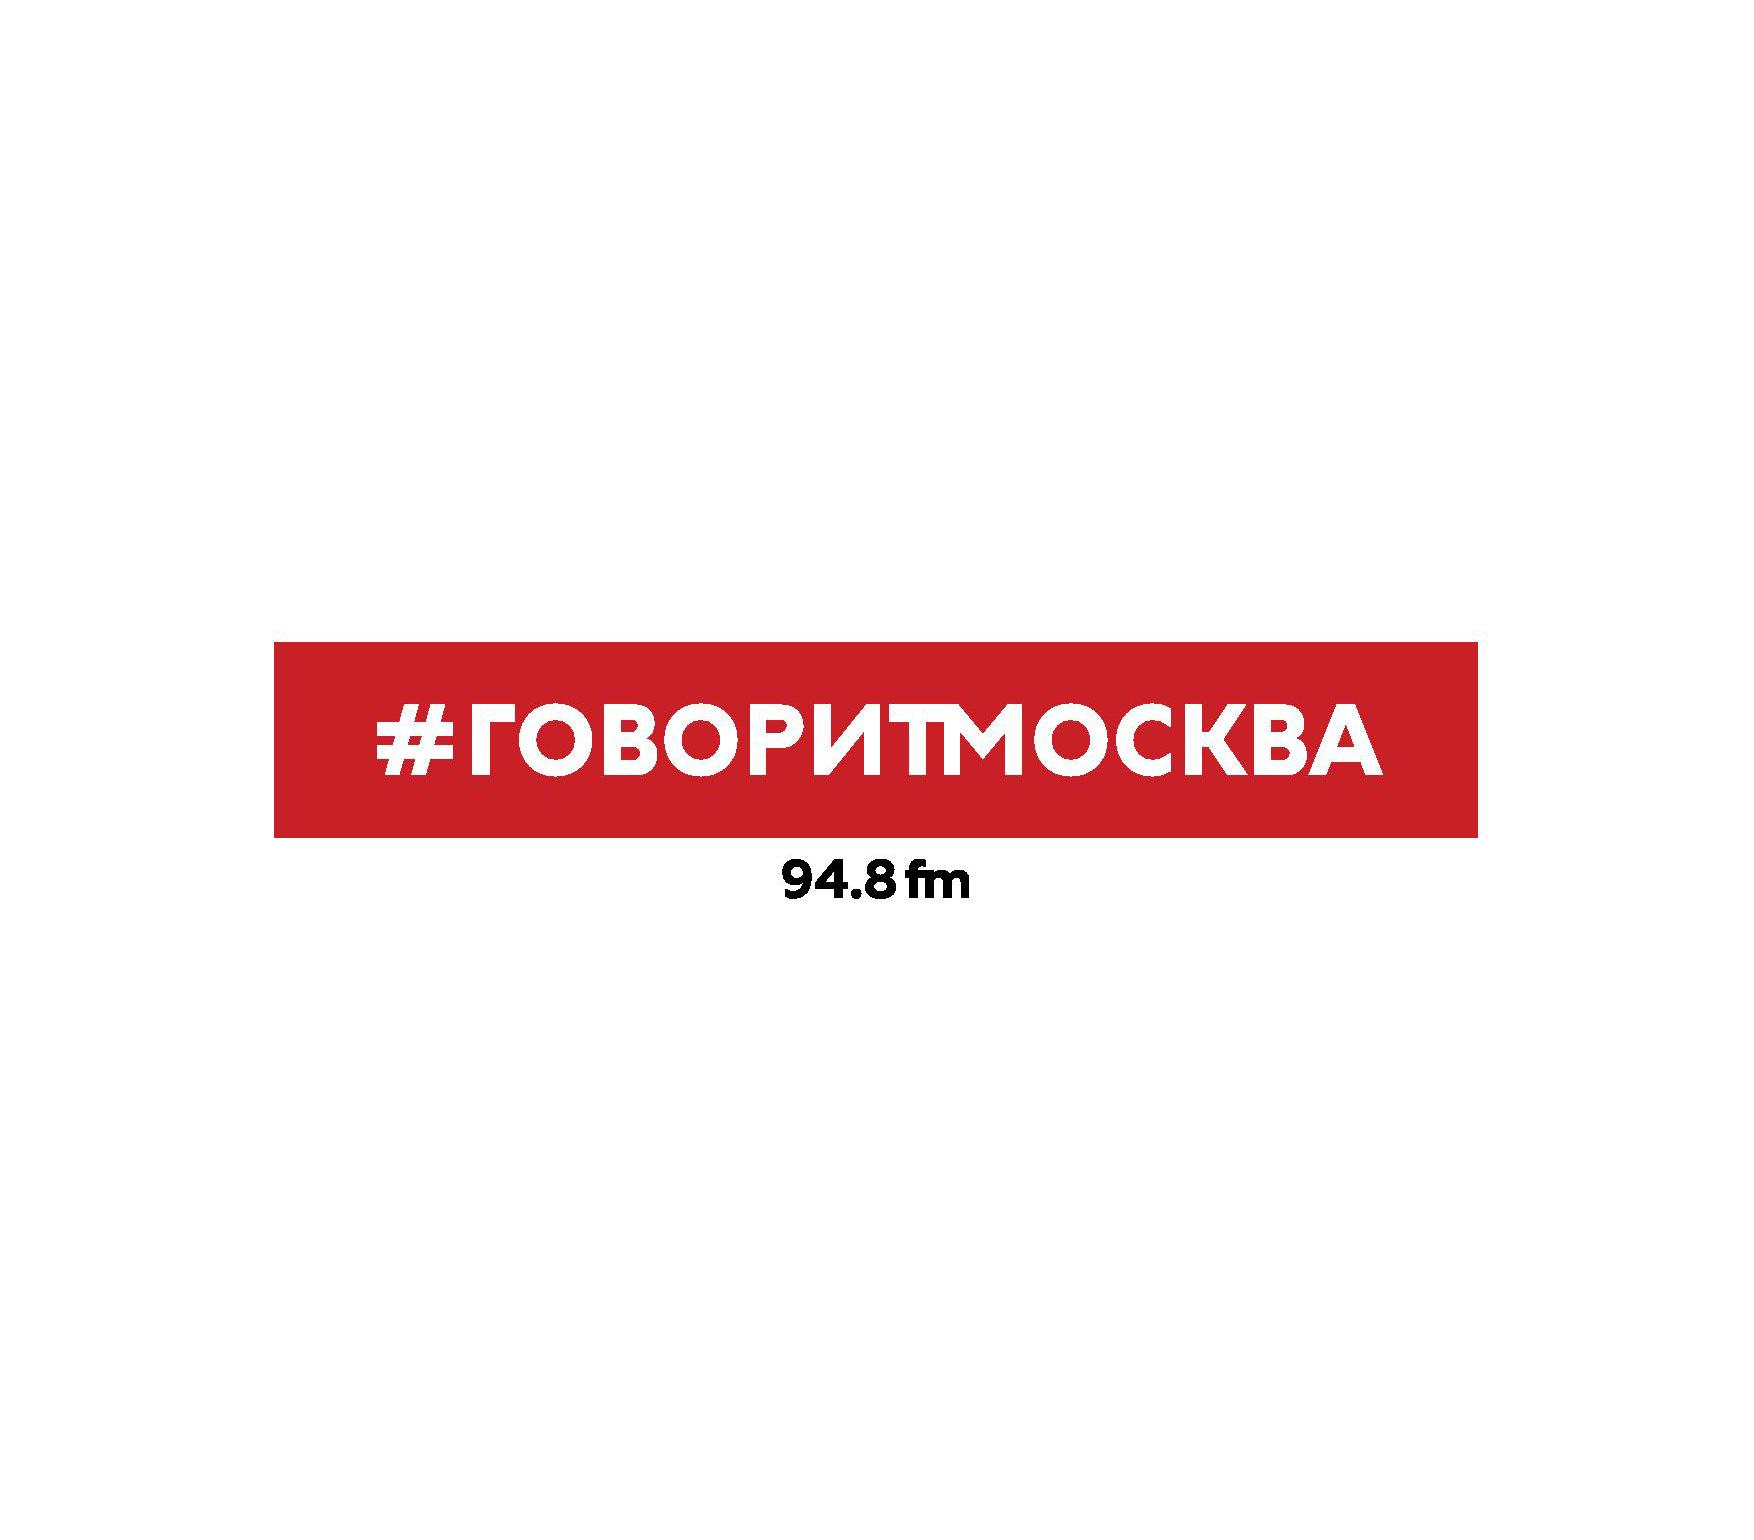 Макс Челноков 21 апреля. Михаил Веллер михаил веллер перпендикуляр